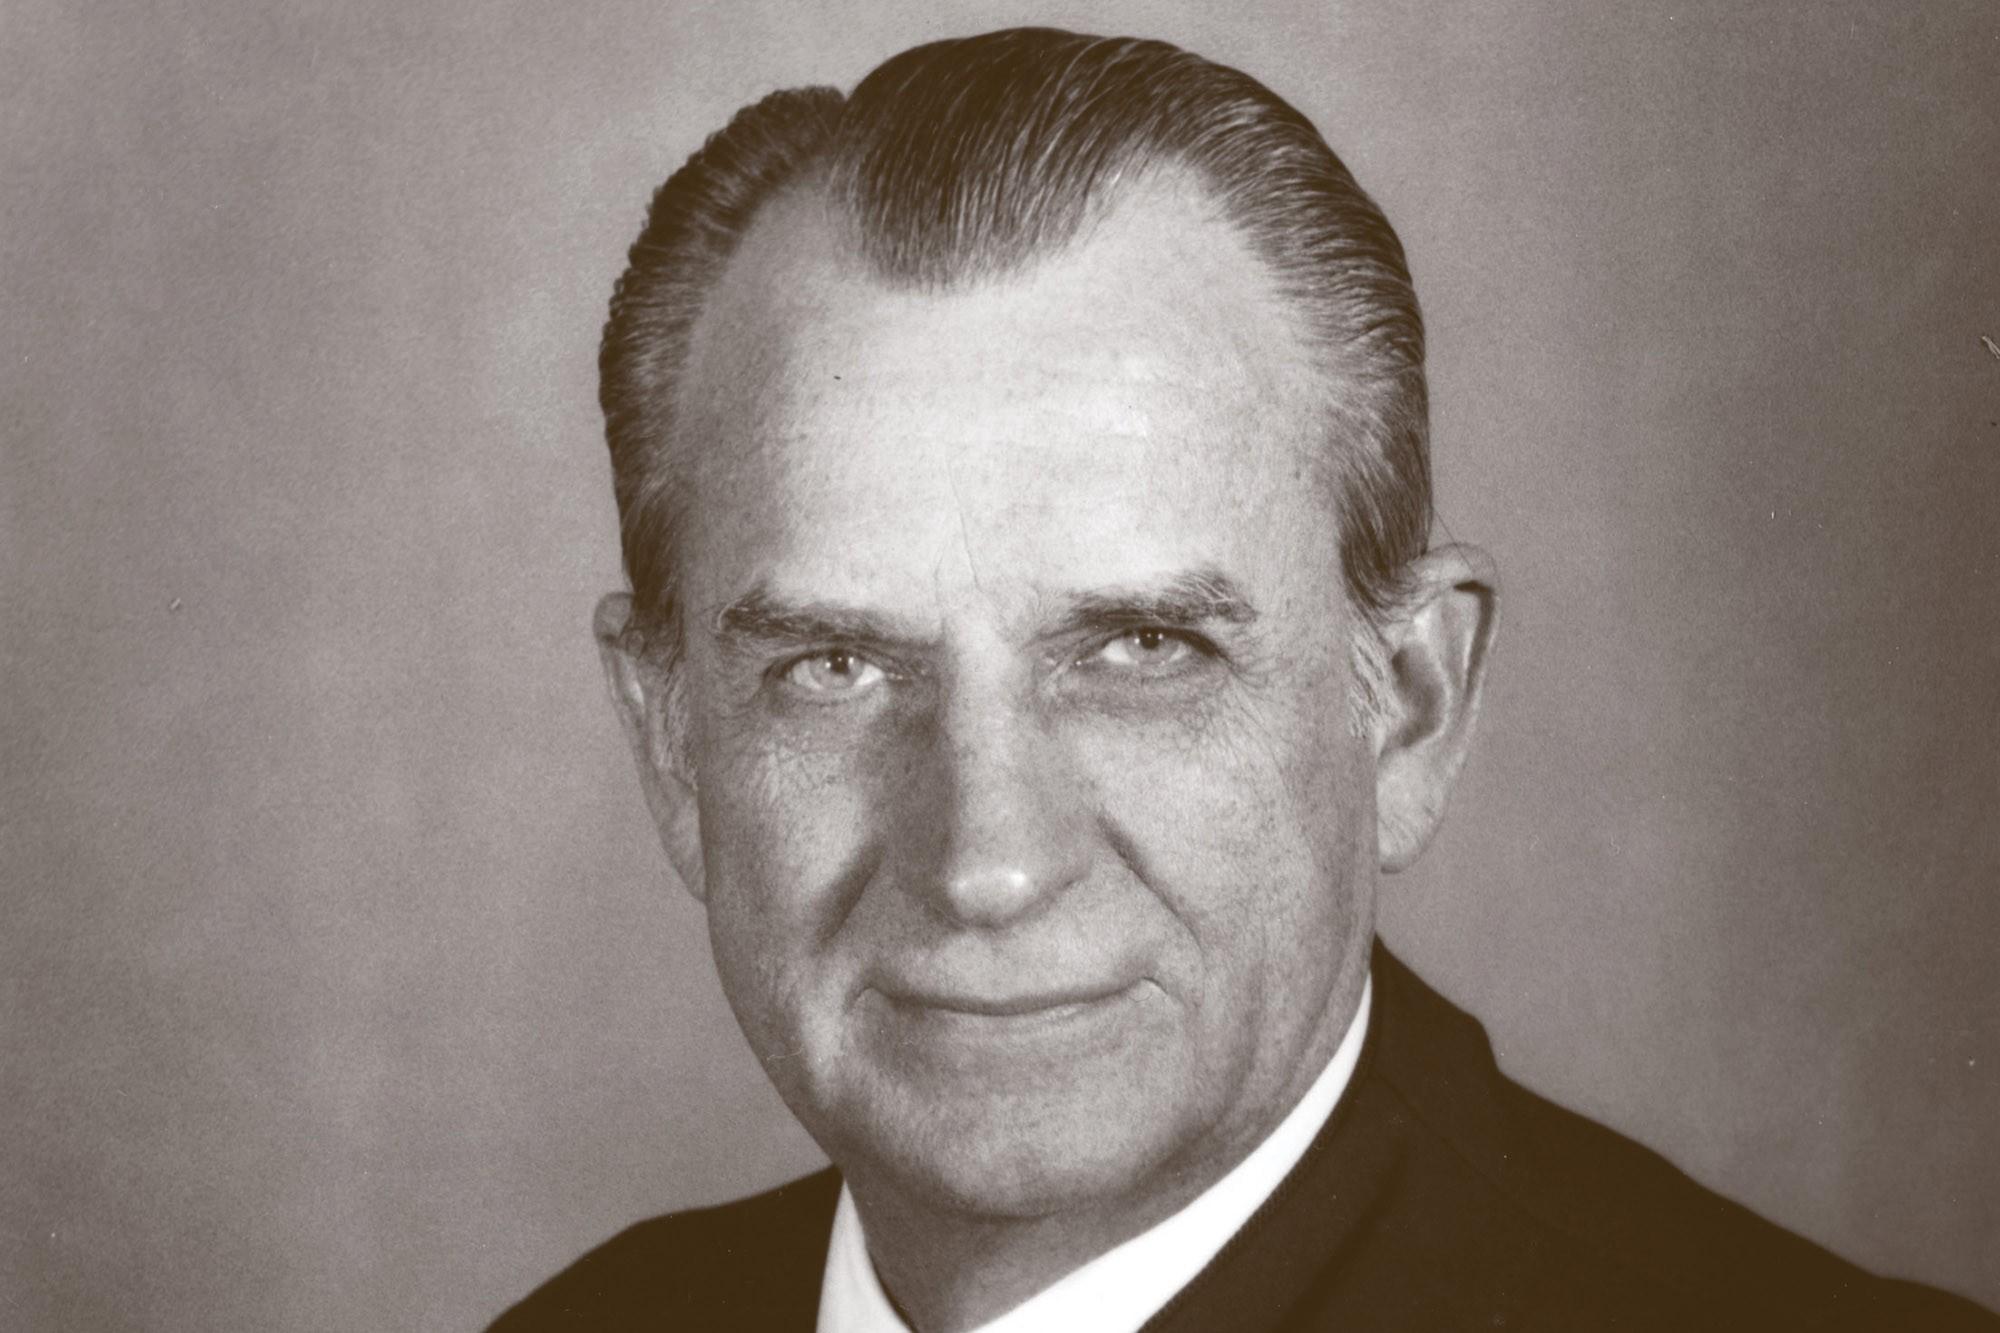 Judge Reavley in 1987